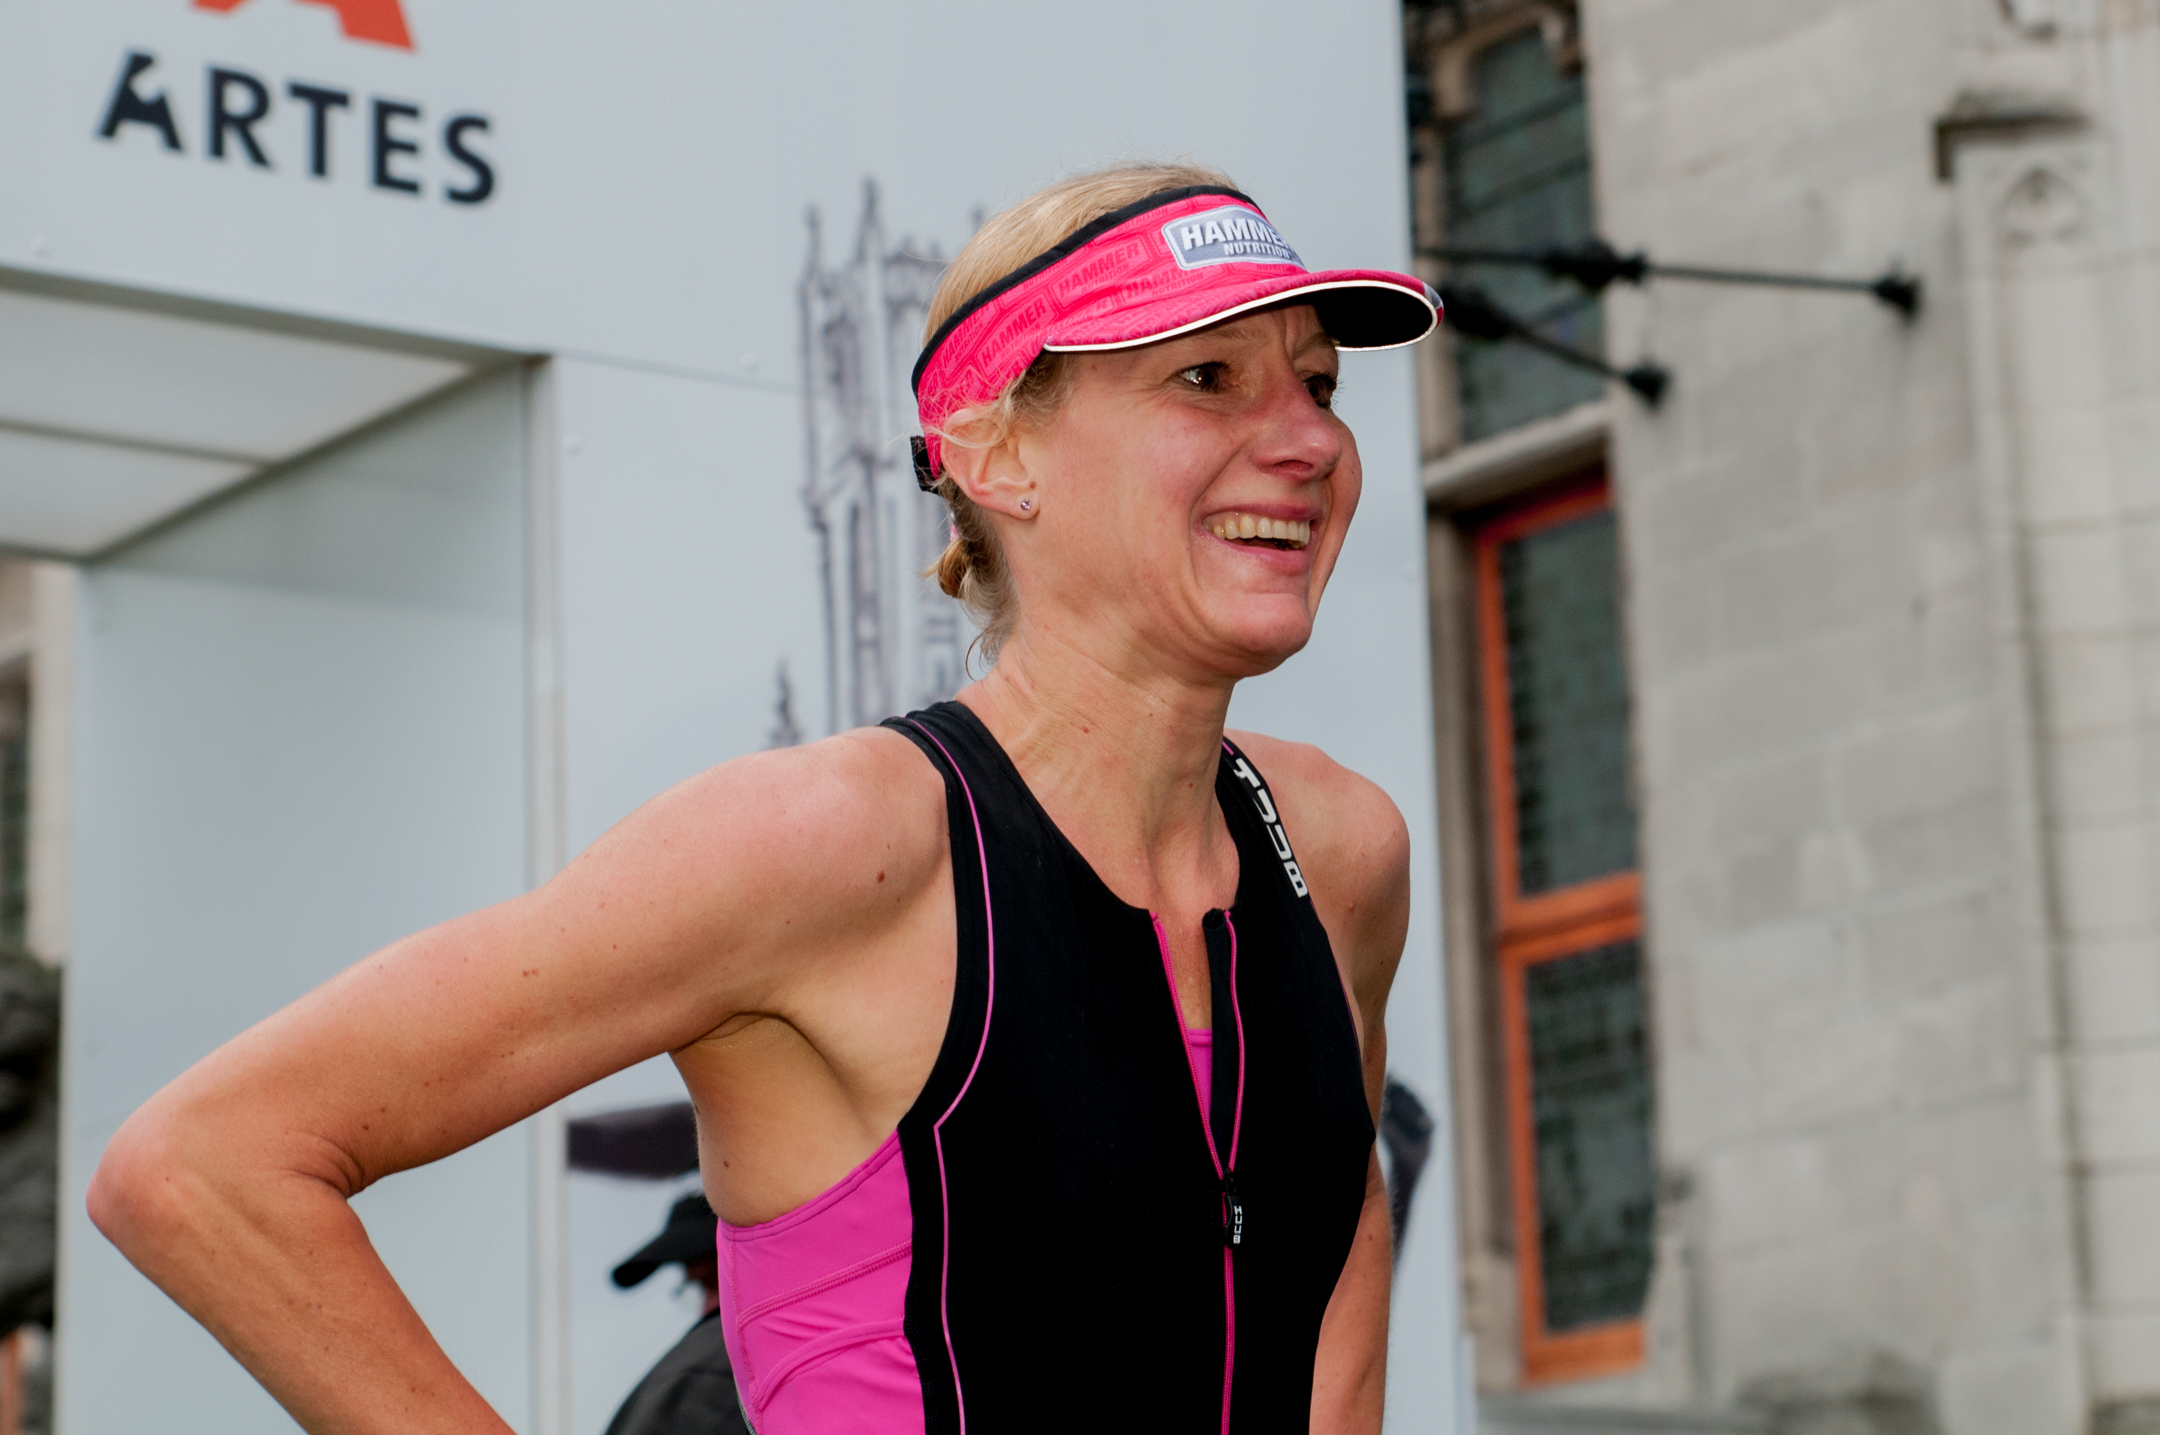 Brugge 2016 Sandra Wassink-Hitzert finish